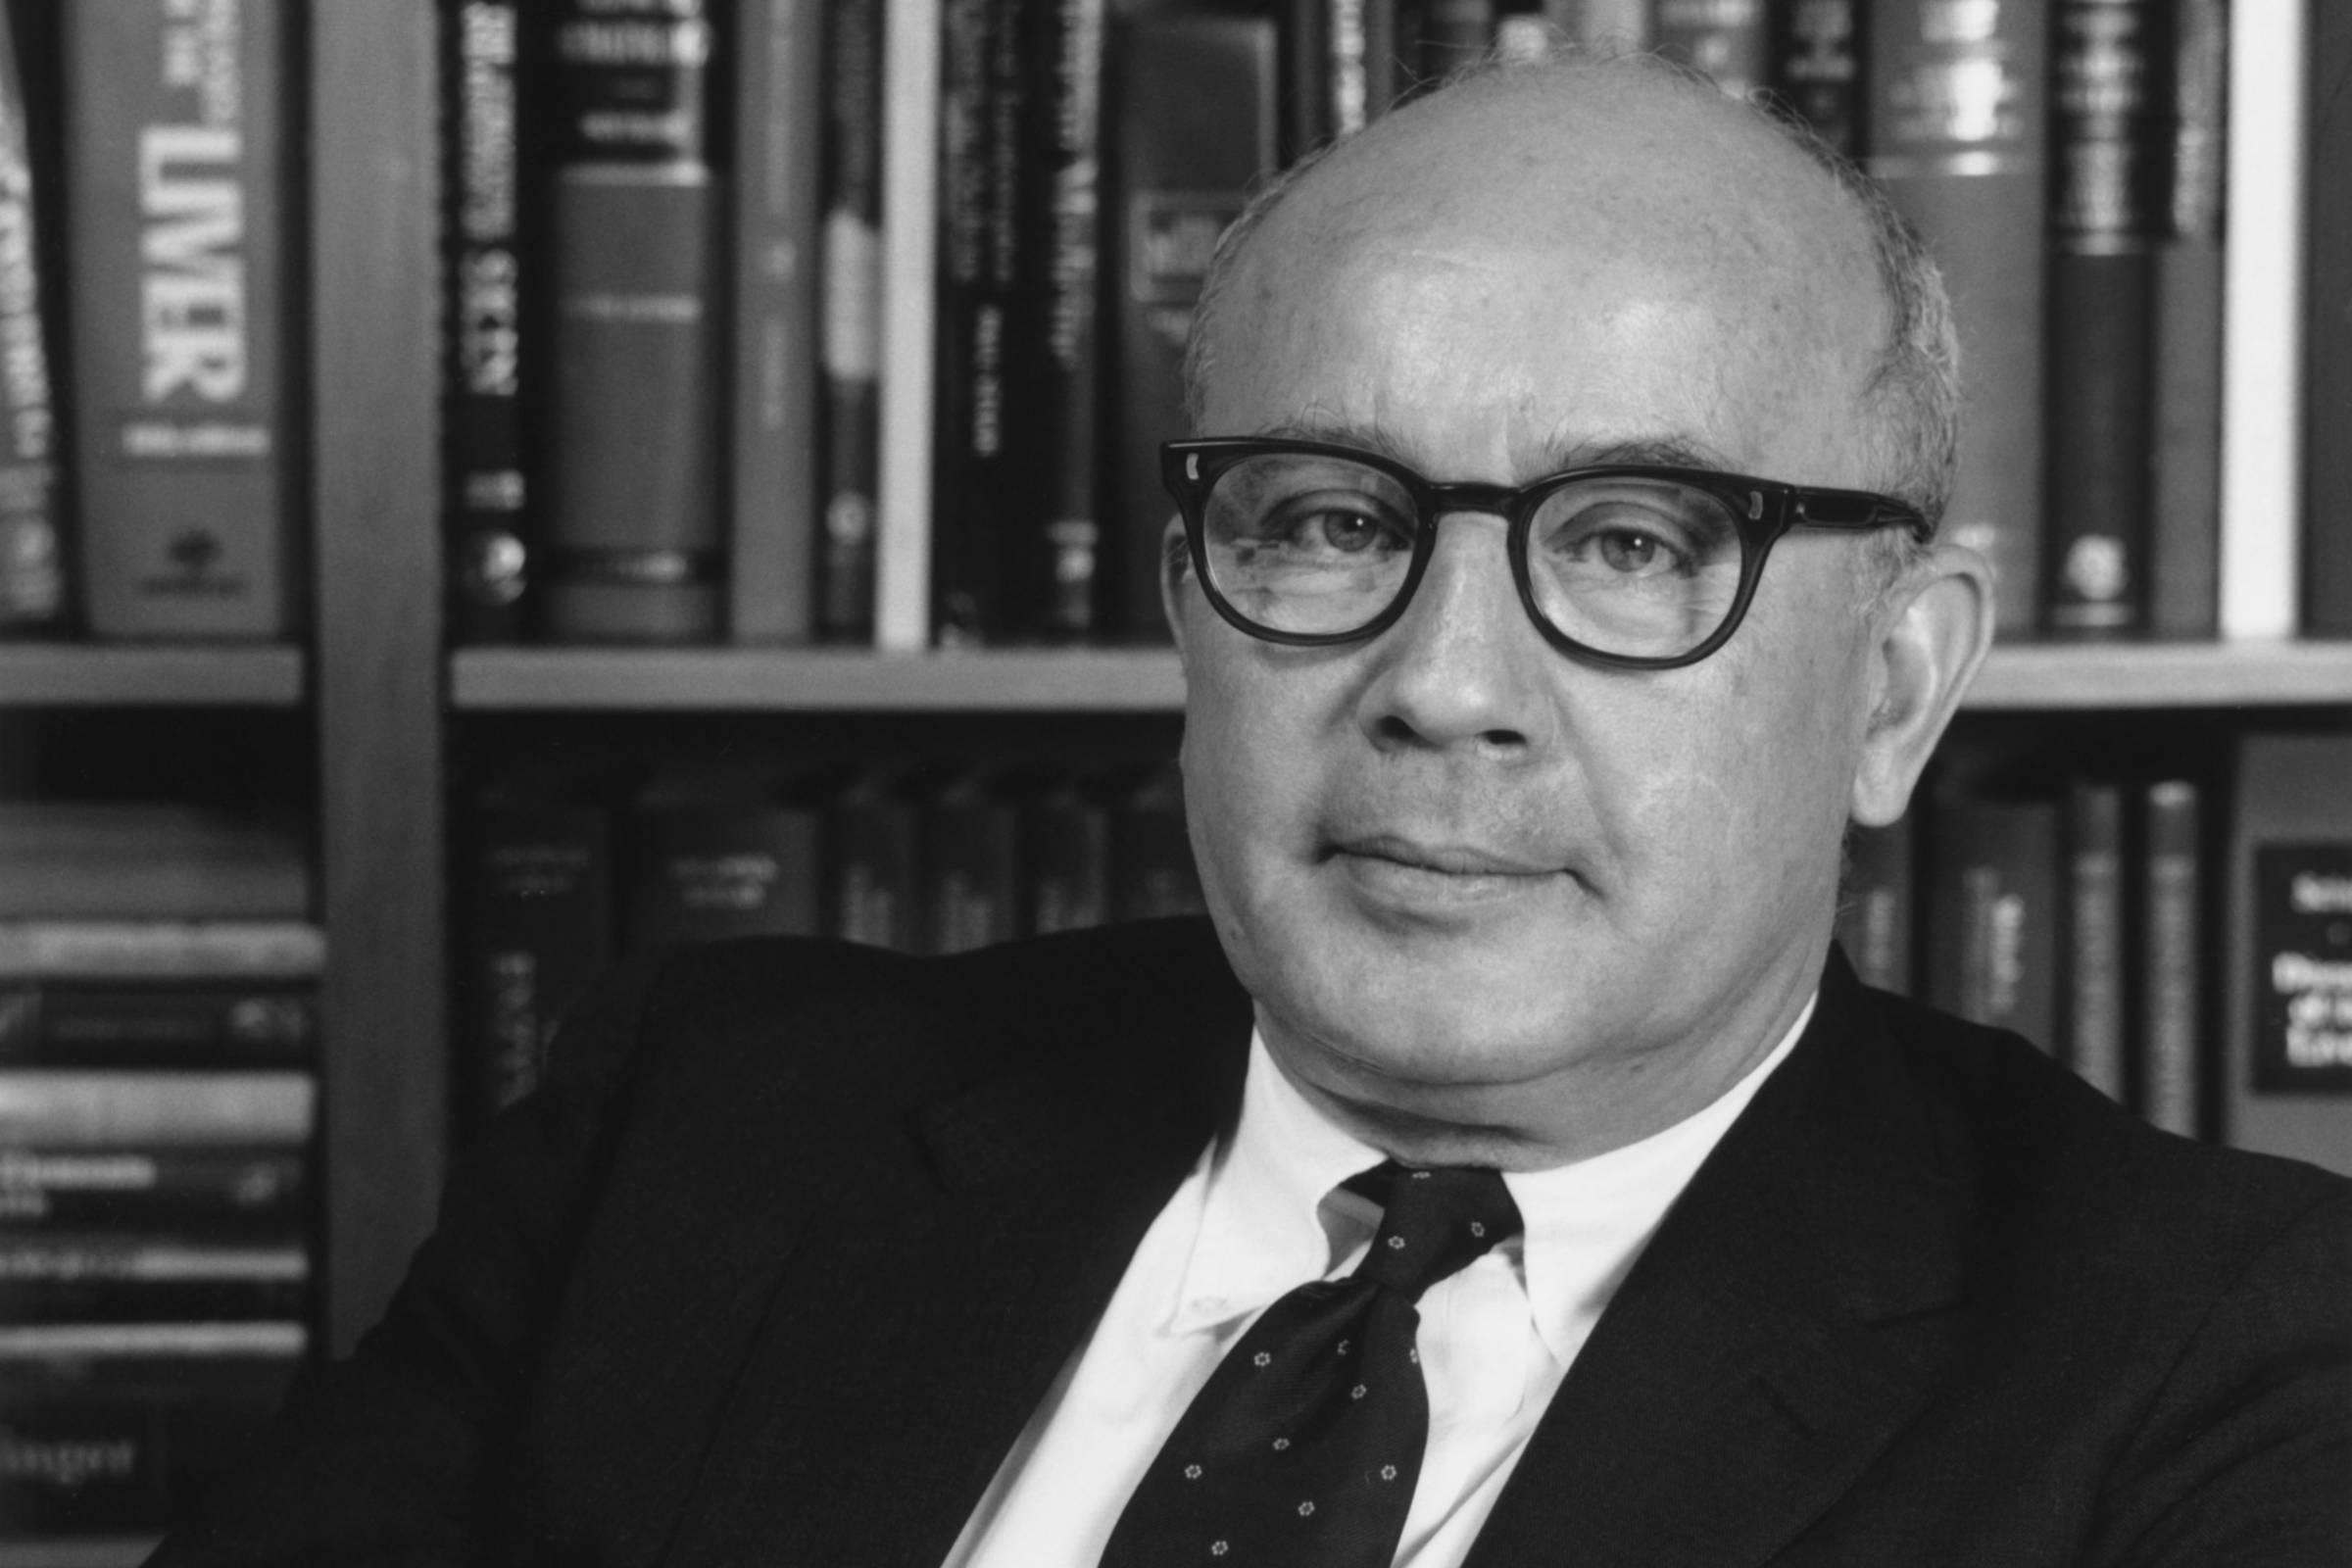 Attallah Kappas, professor emeritus at The Rockefeller University